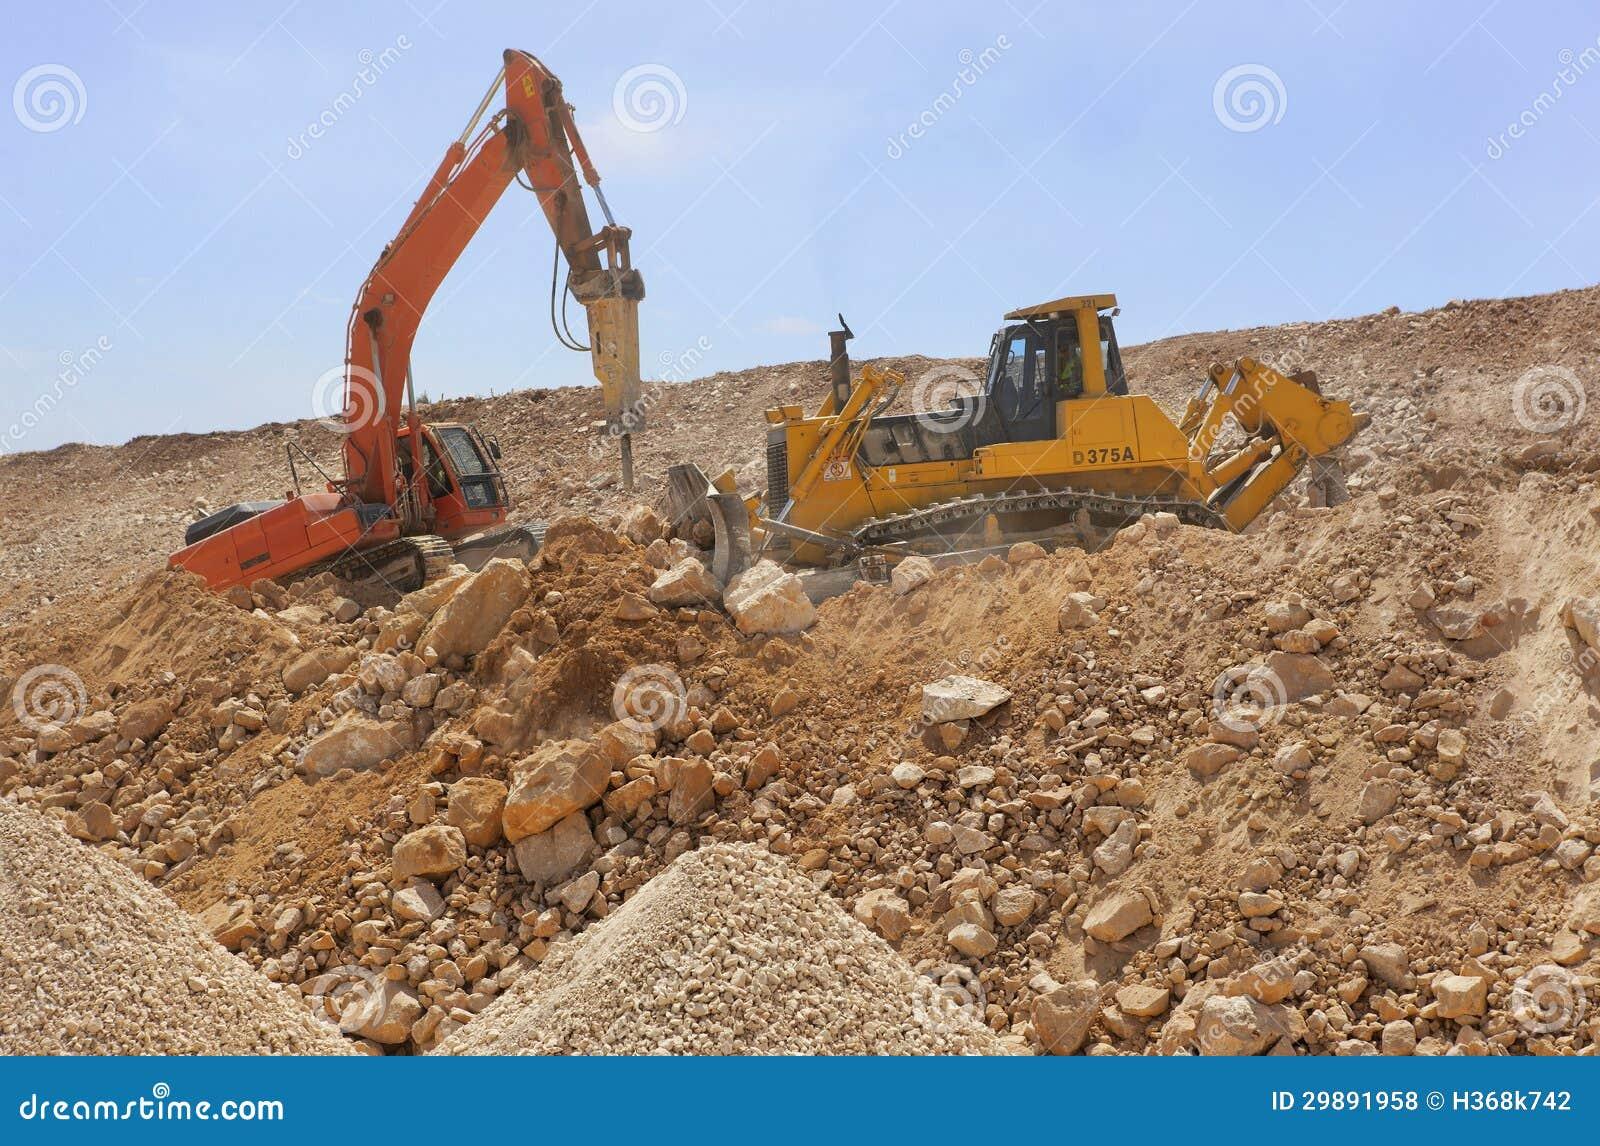 Construction Site Soil : Excavator machines loading soil royalty free stock photos